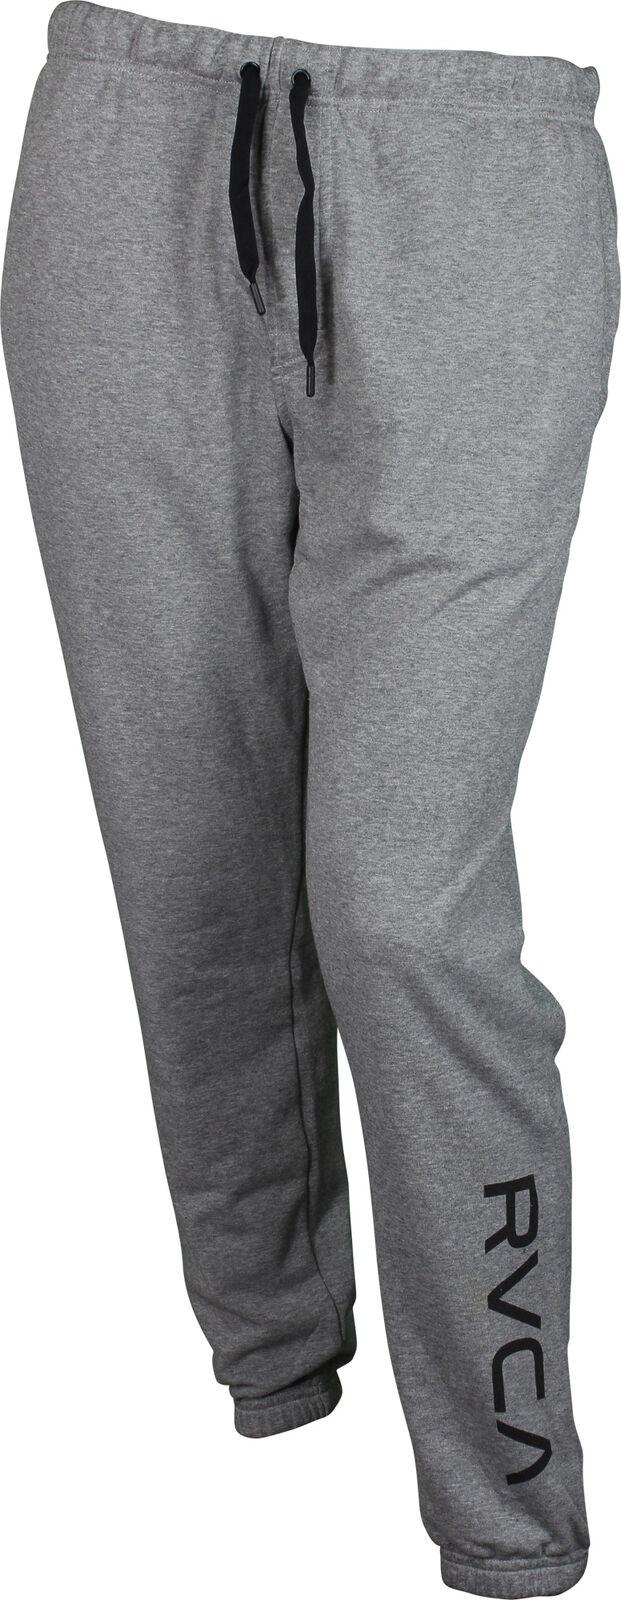 RVCA VA Sport VA Guard Fleece Sweatpant (Heather grau)